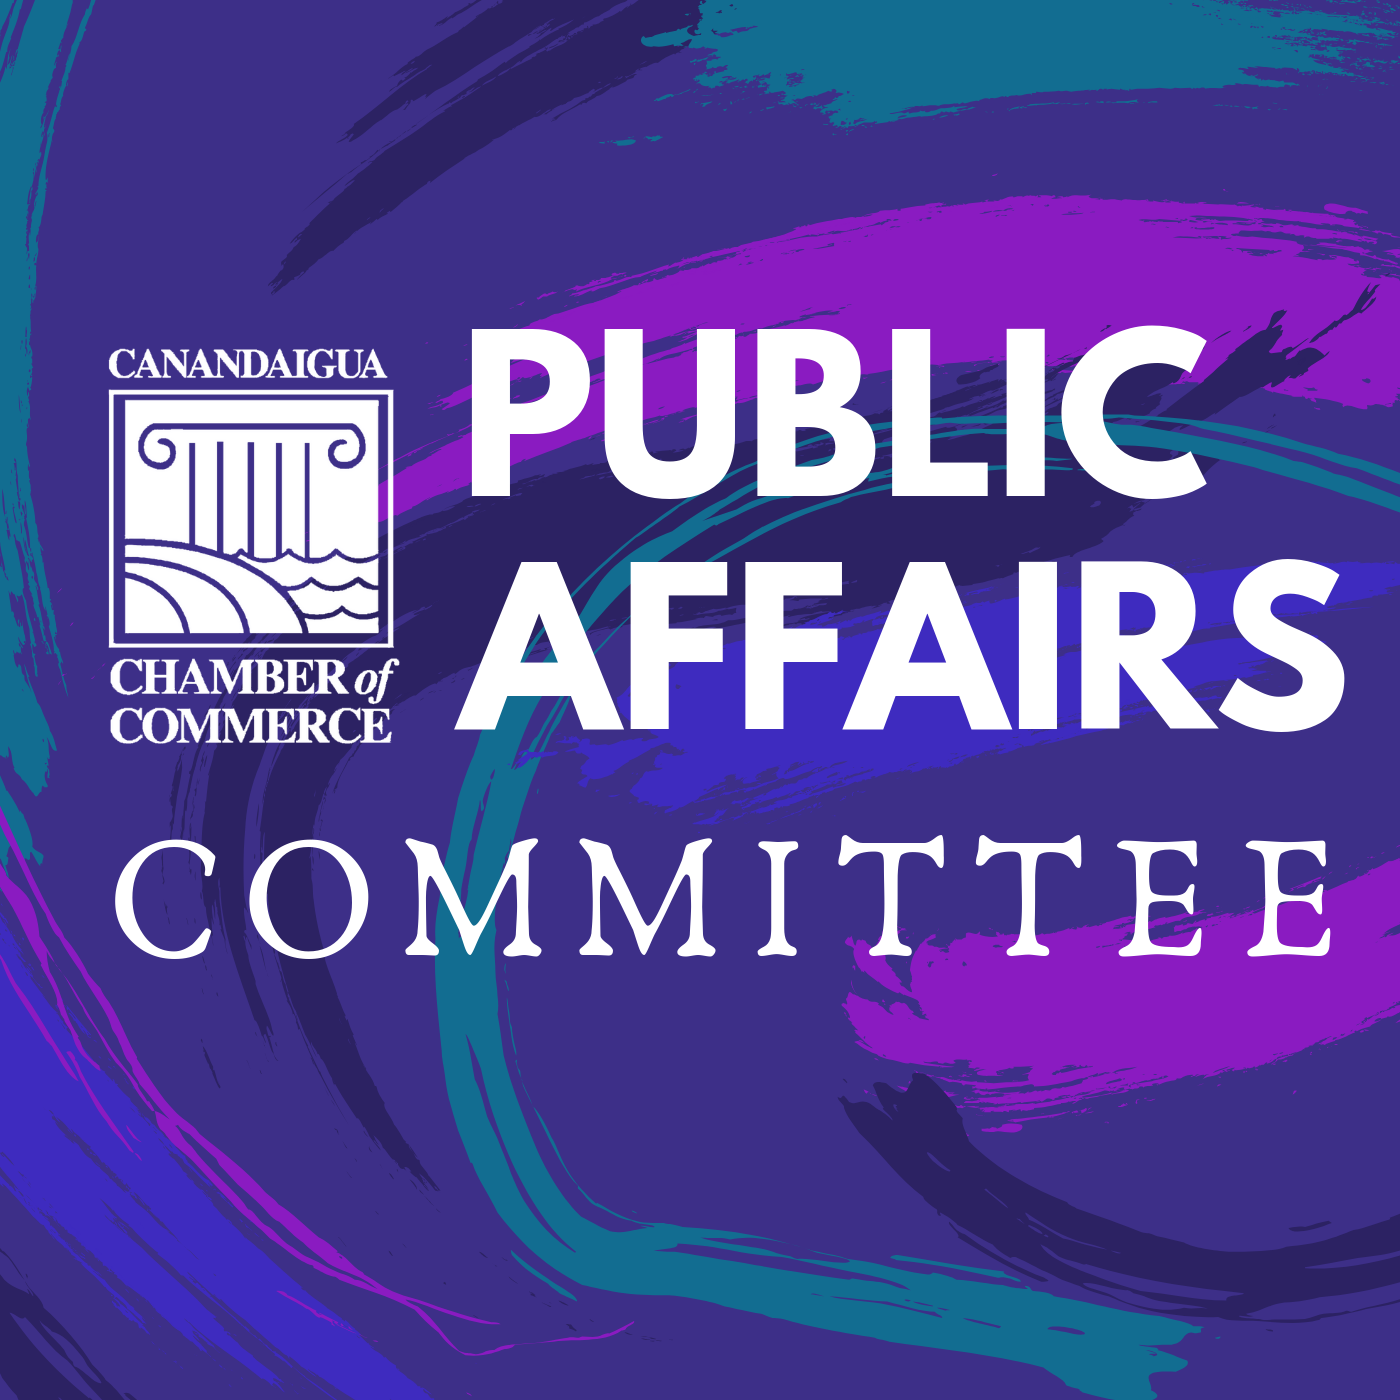 public affairs committee logo